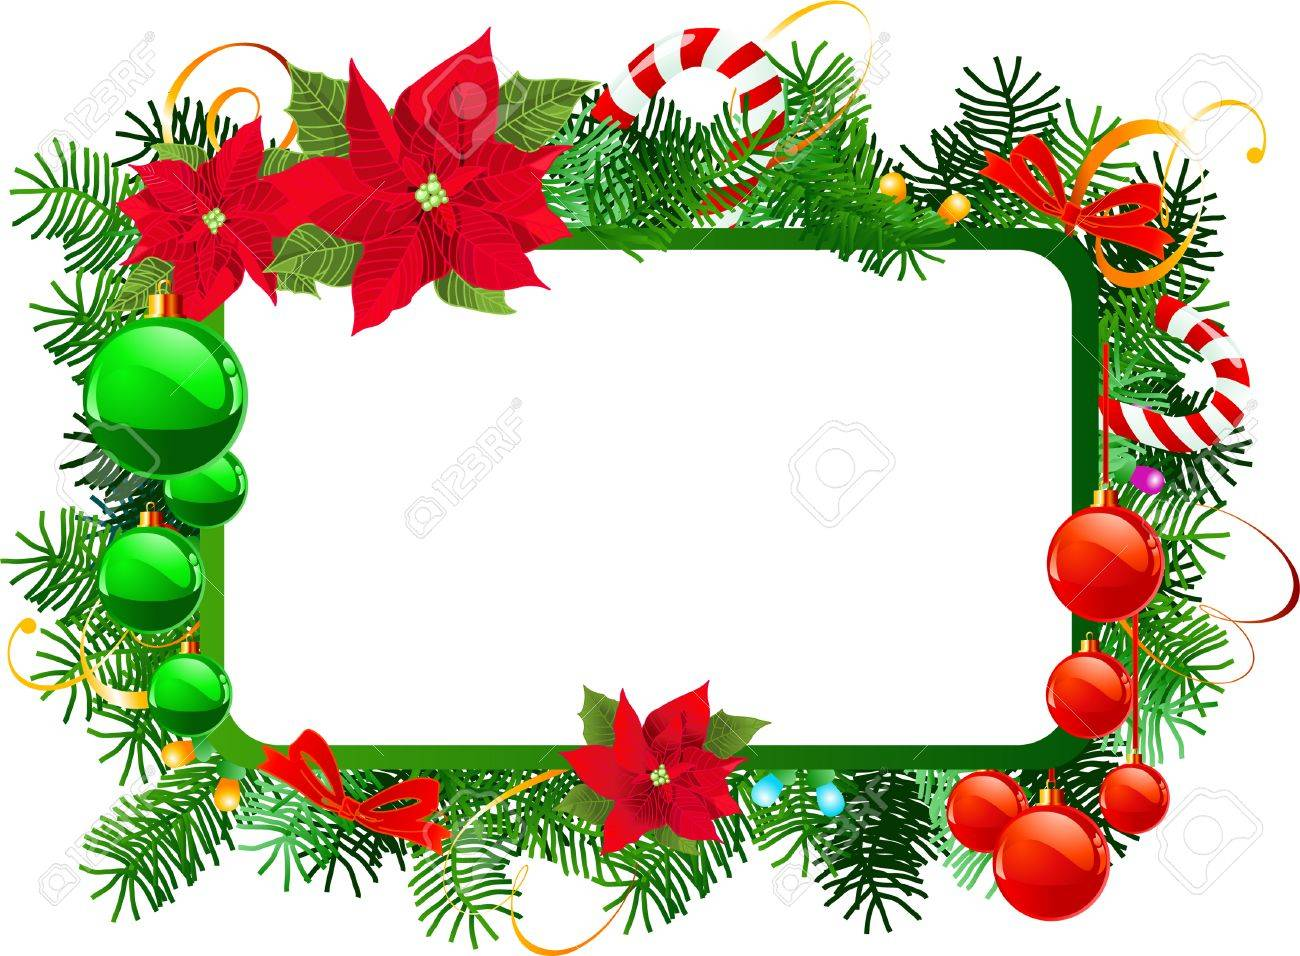 Christmas frame with Christmas decoration. Stock Vector - 5959264